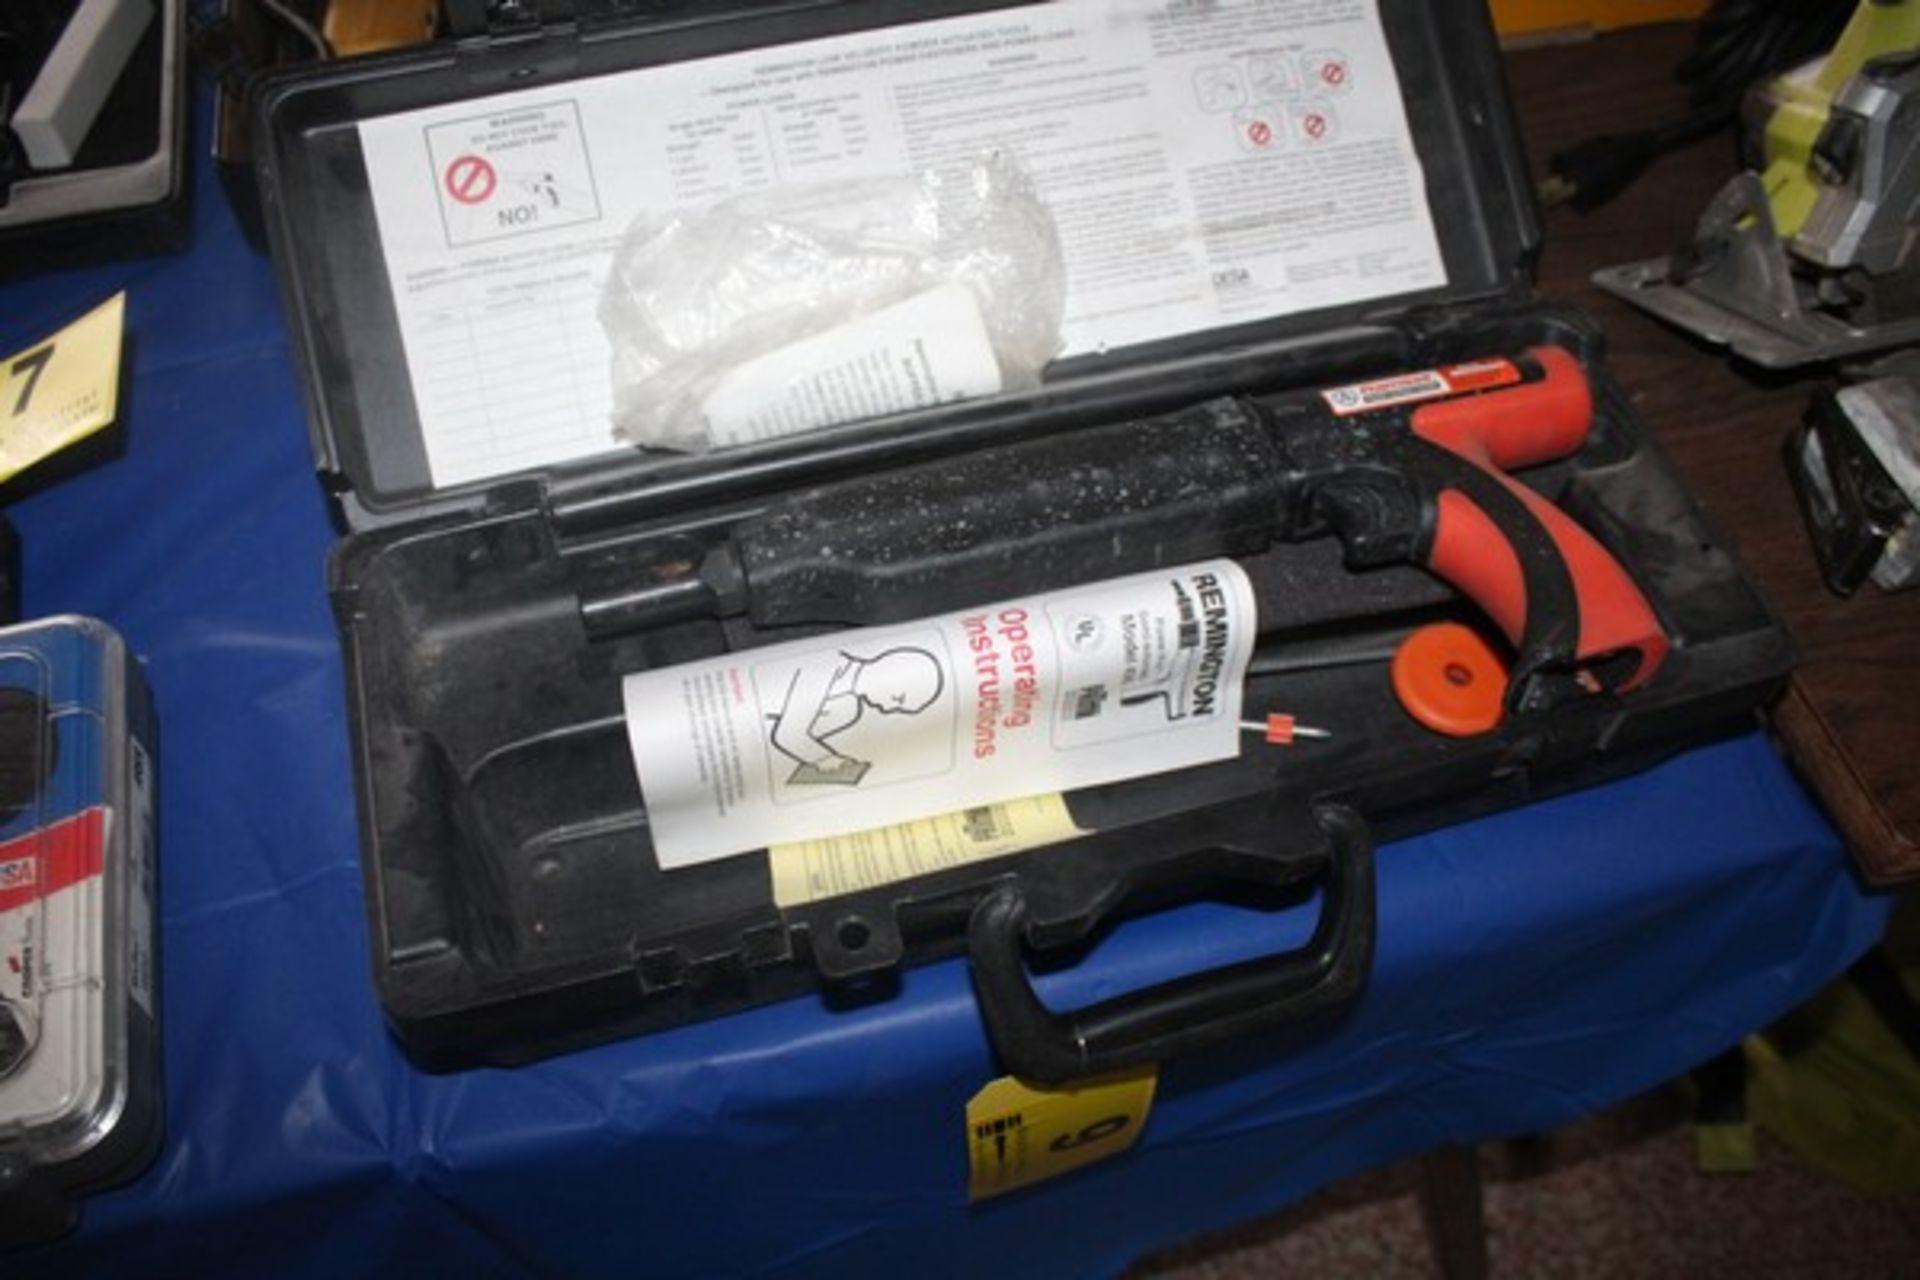 RAMSET MODEL 70902466 POWDER FASTENING TOOL WITH CASE